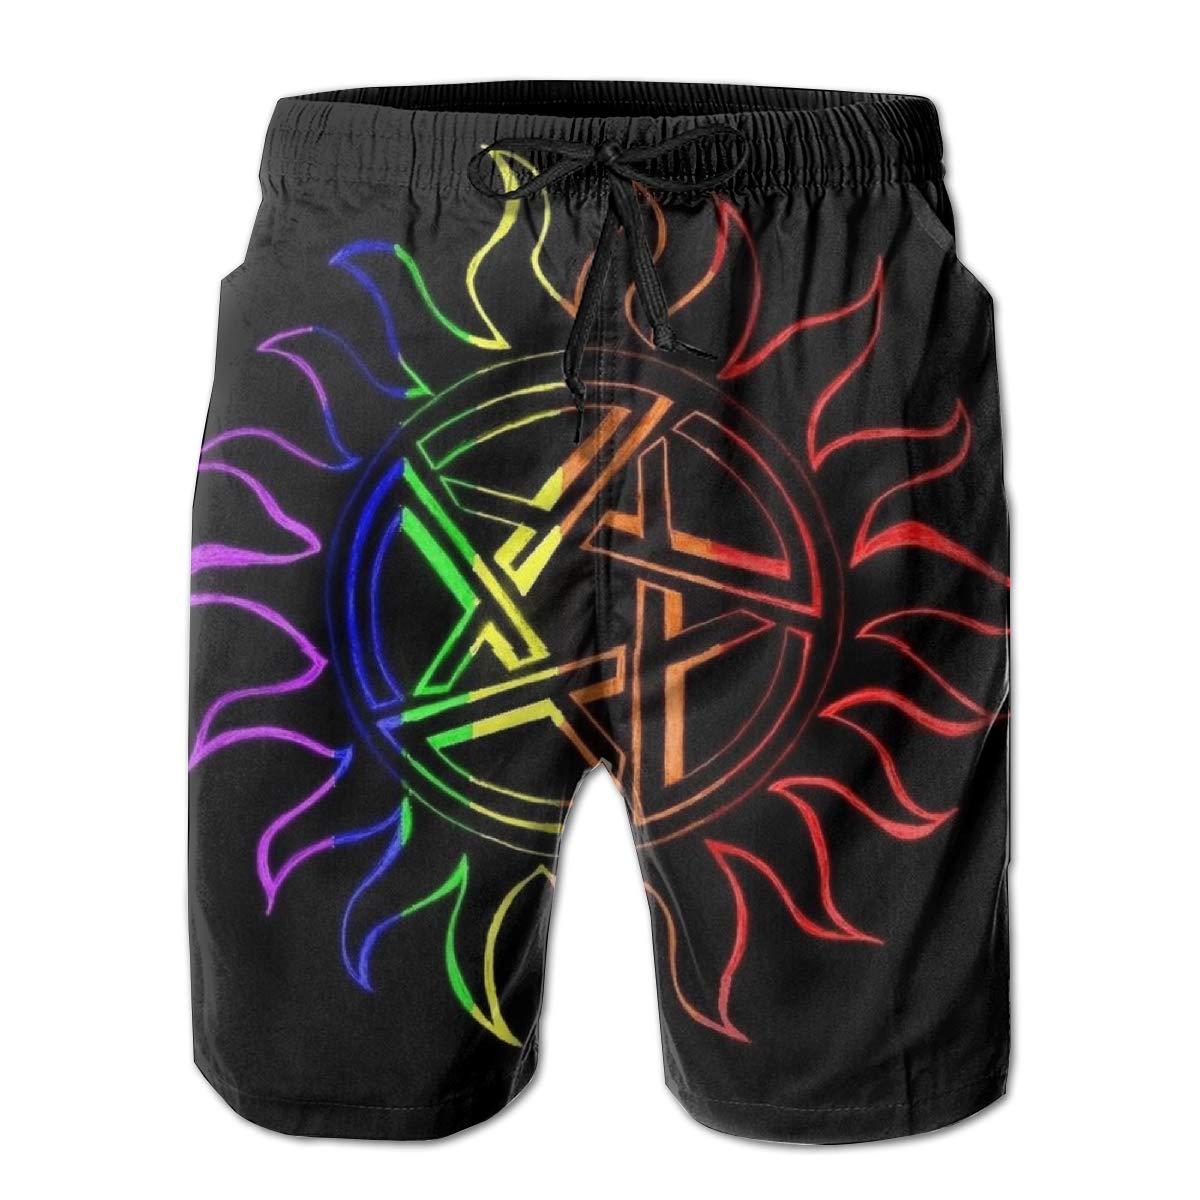 3D Printing Beach Shorts Supernatural-Enochian Tonal Black Swim Trunks